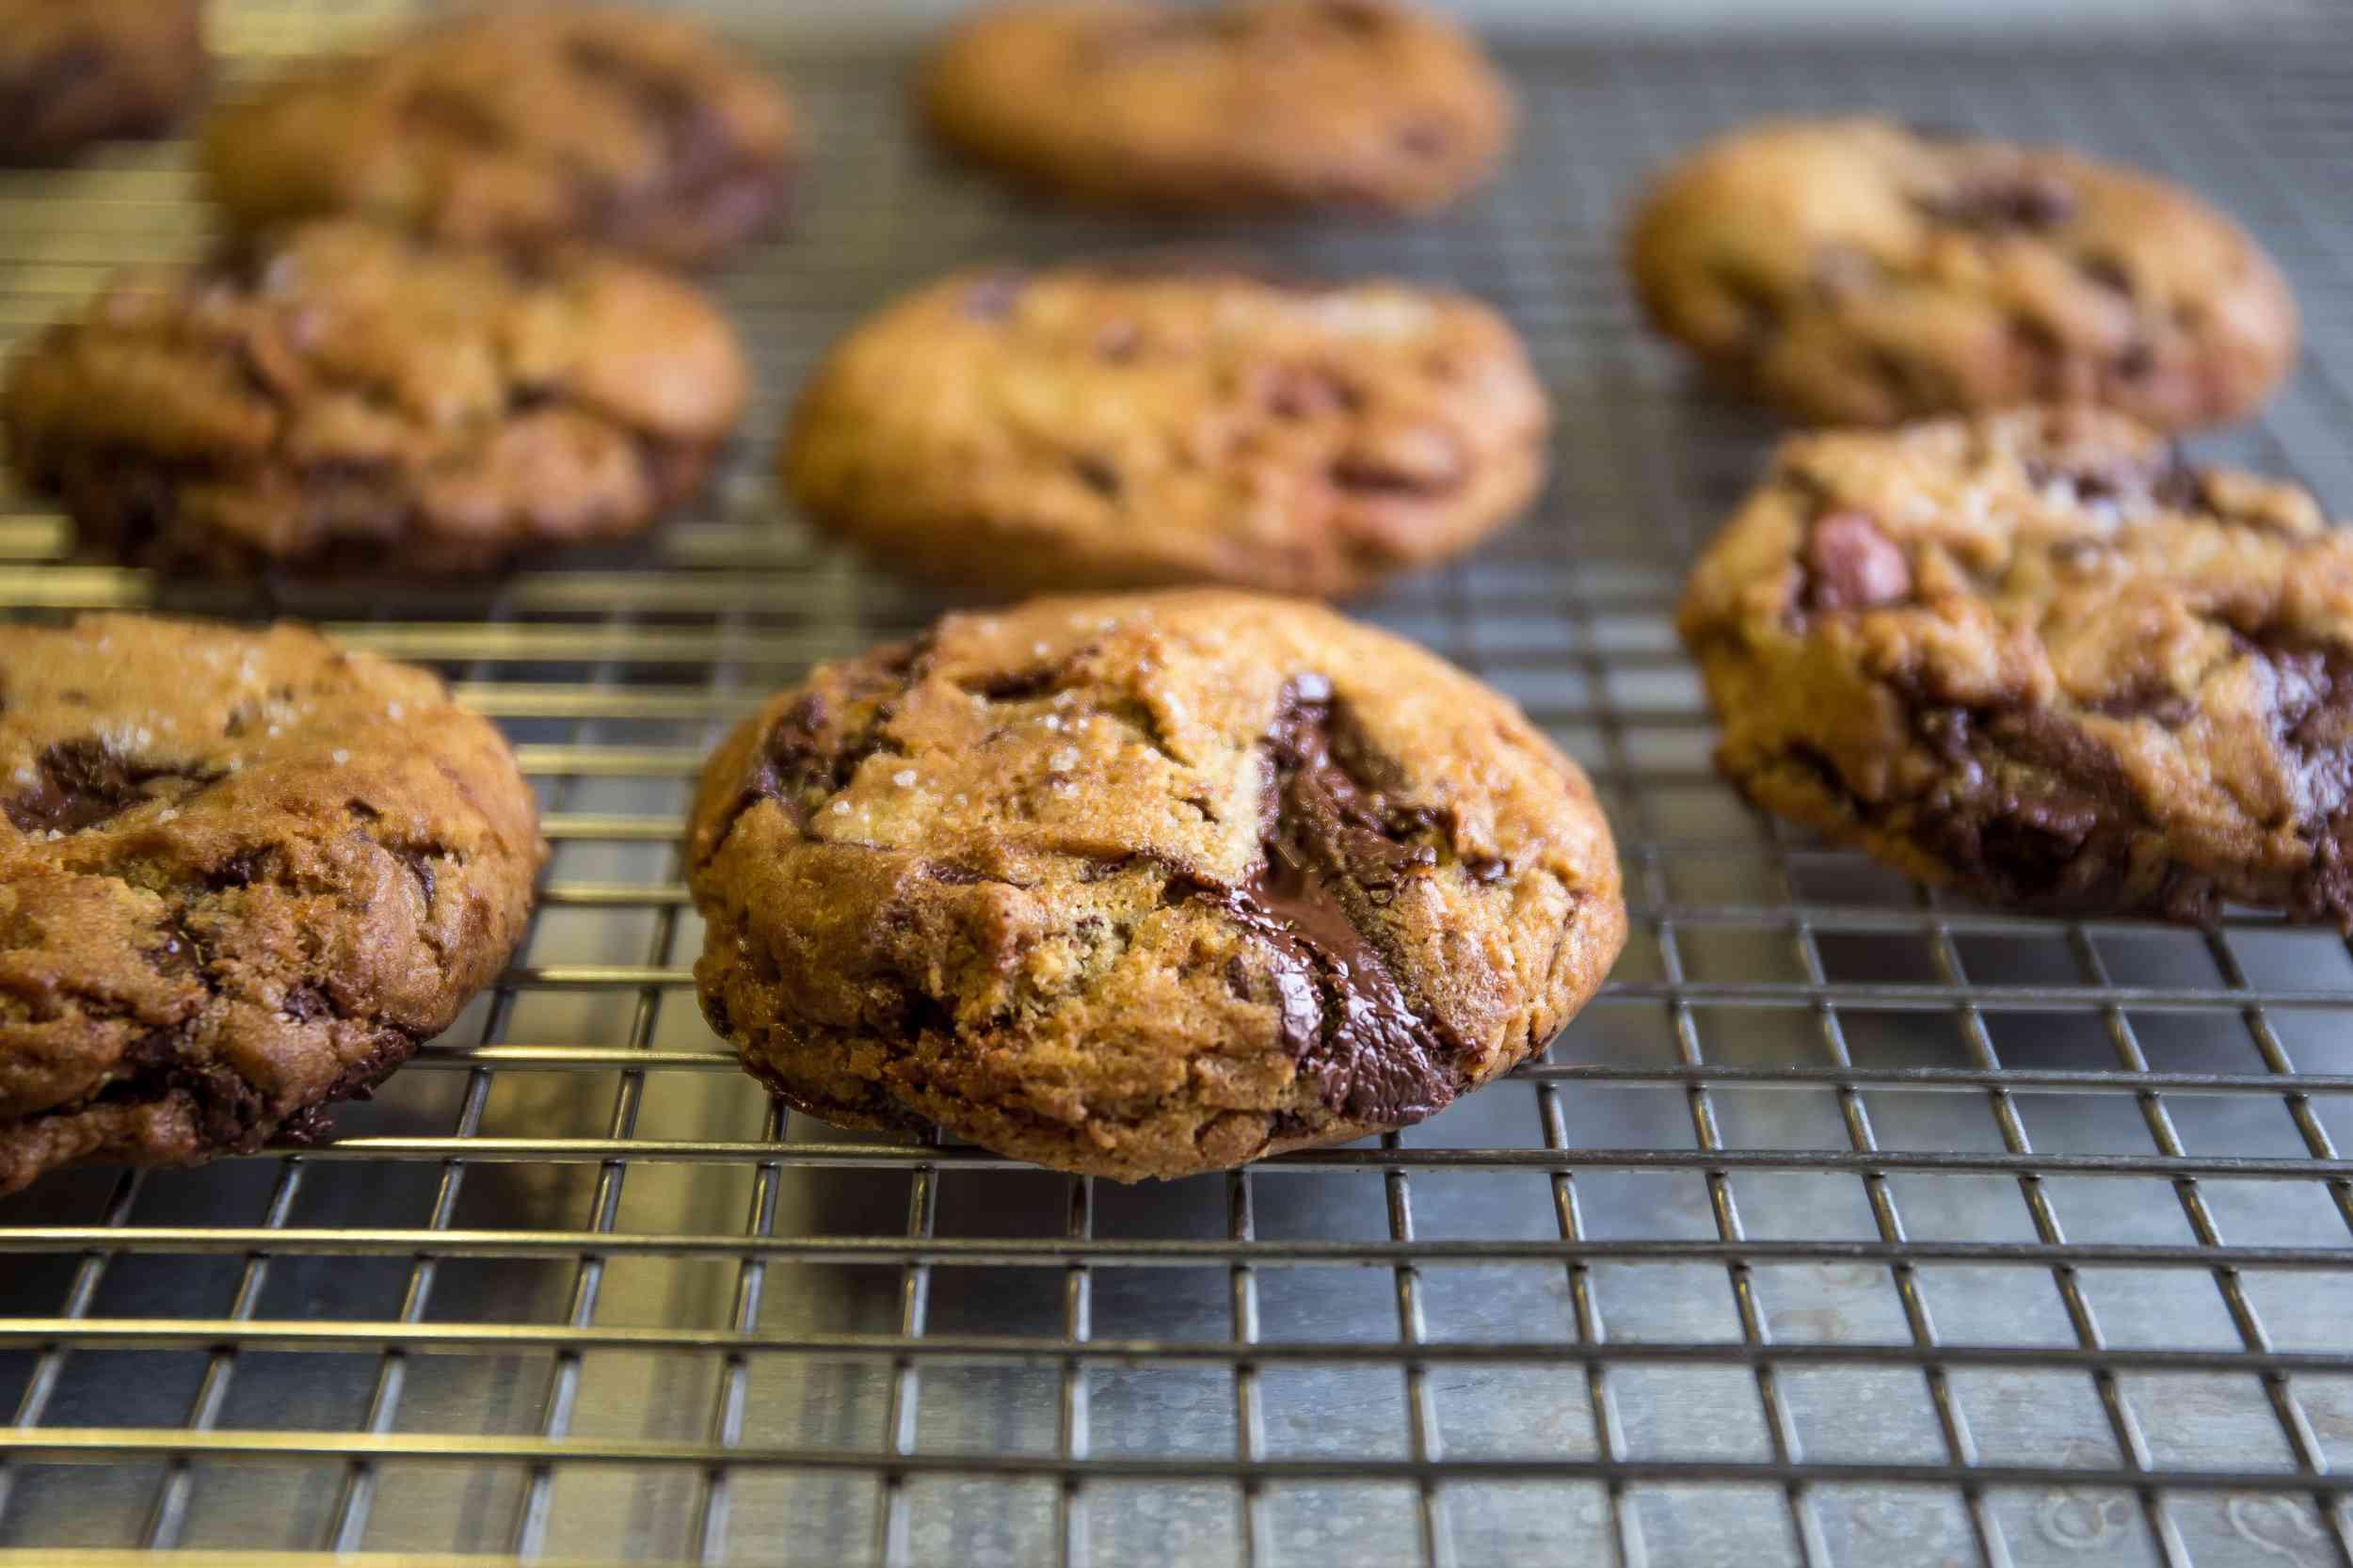 Coquine's chocolate chip cookies